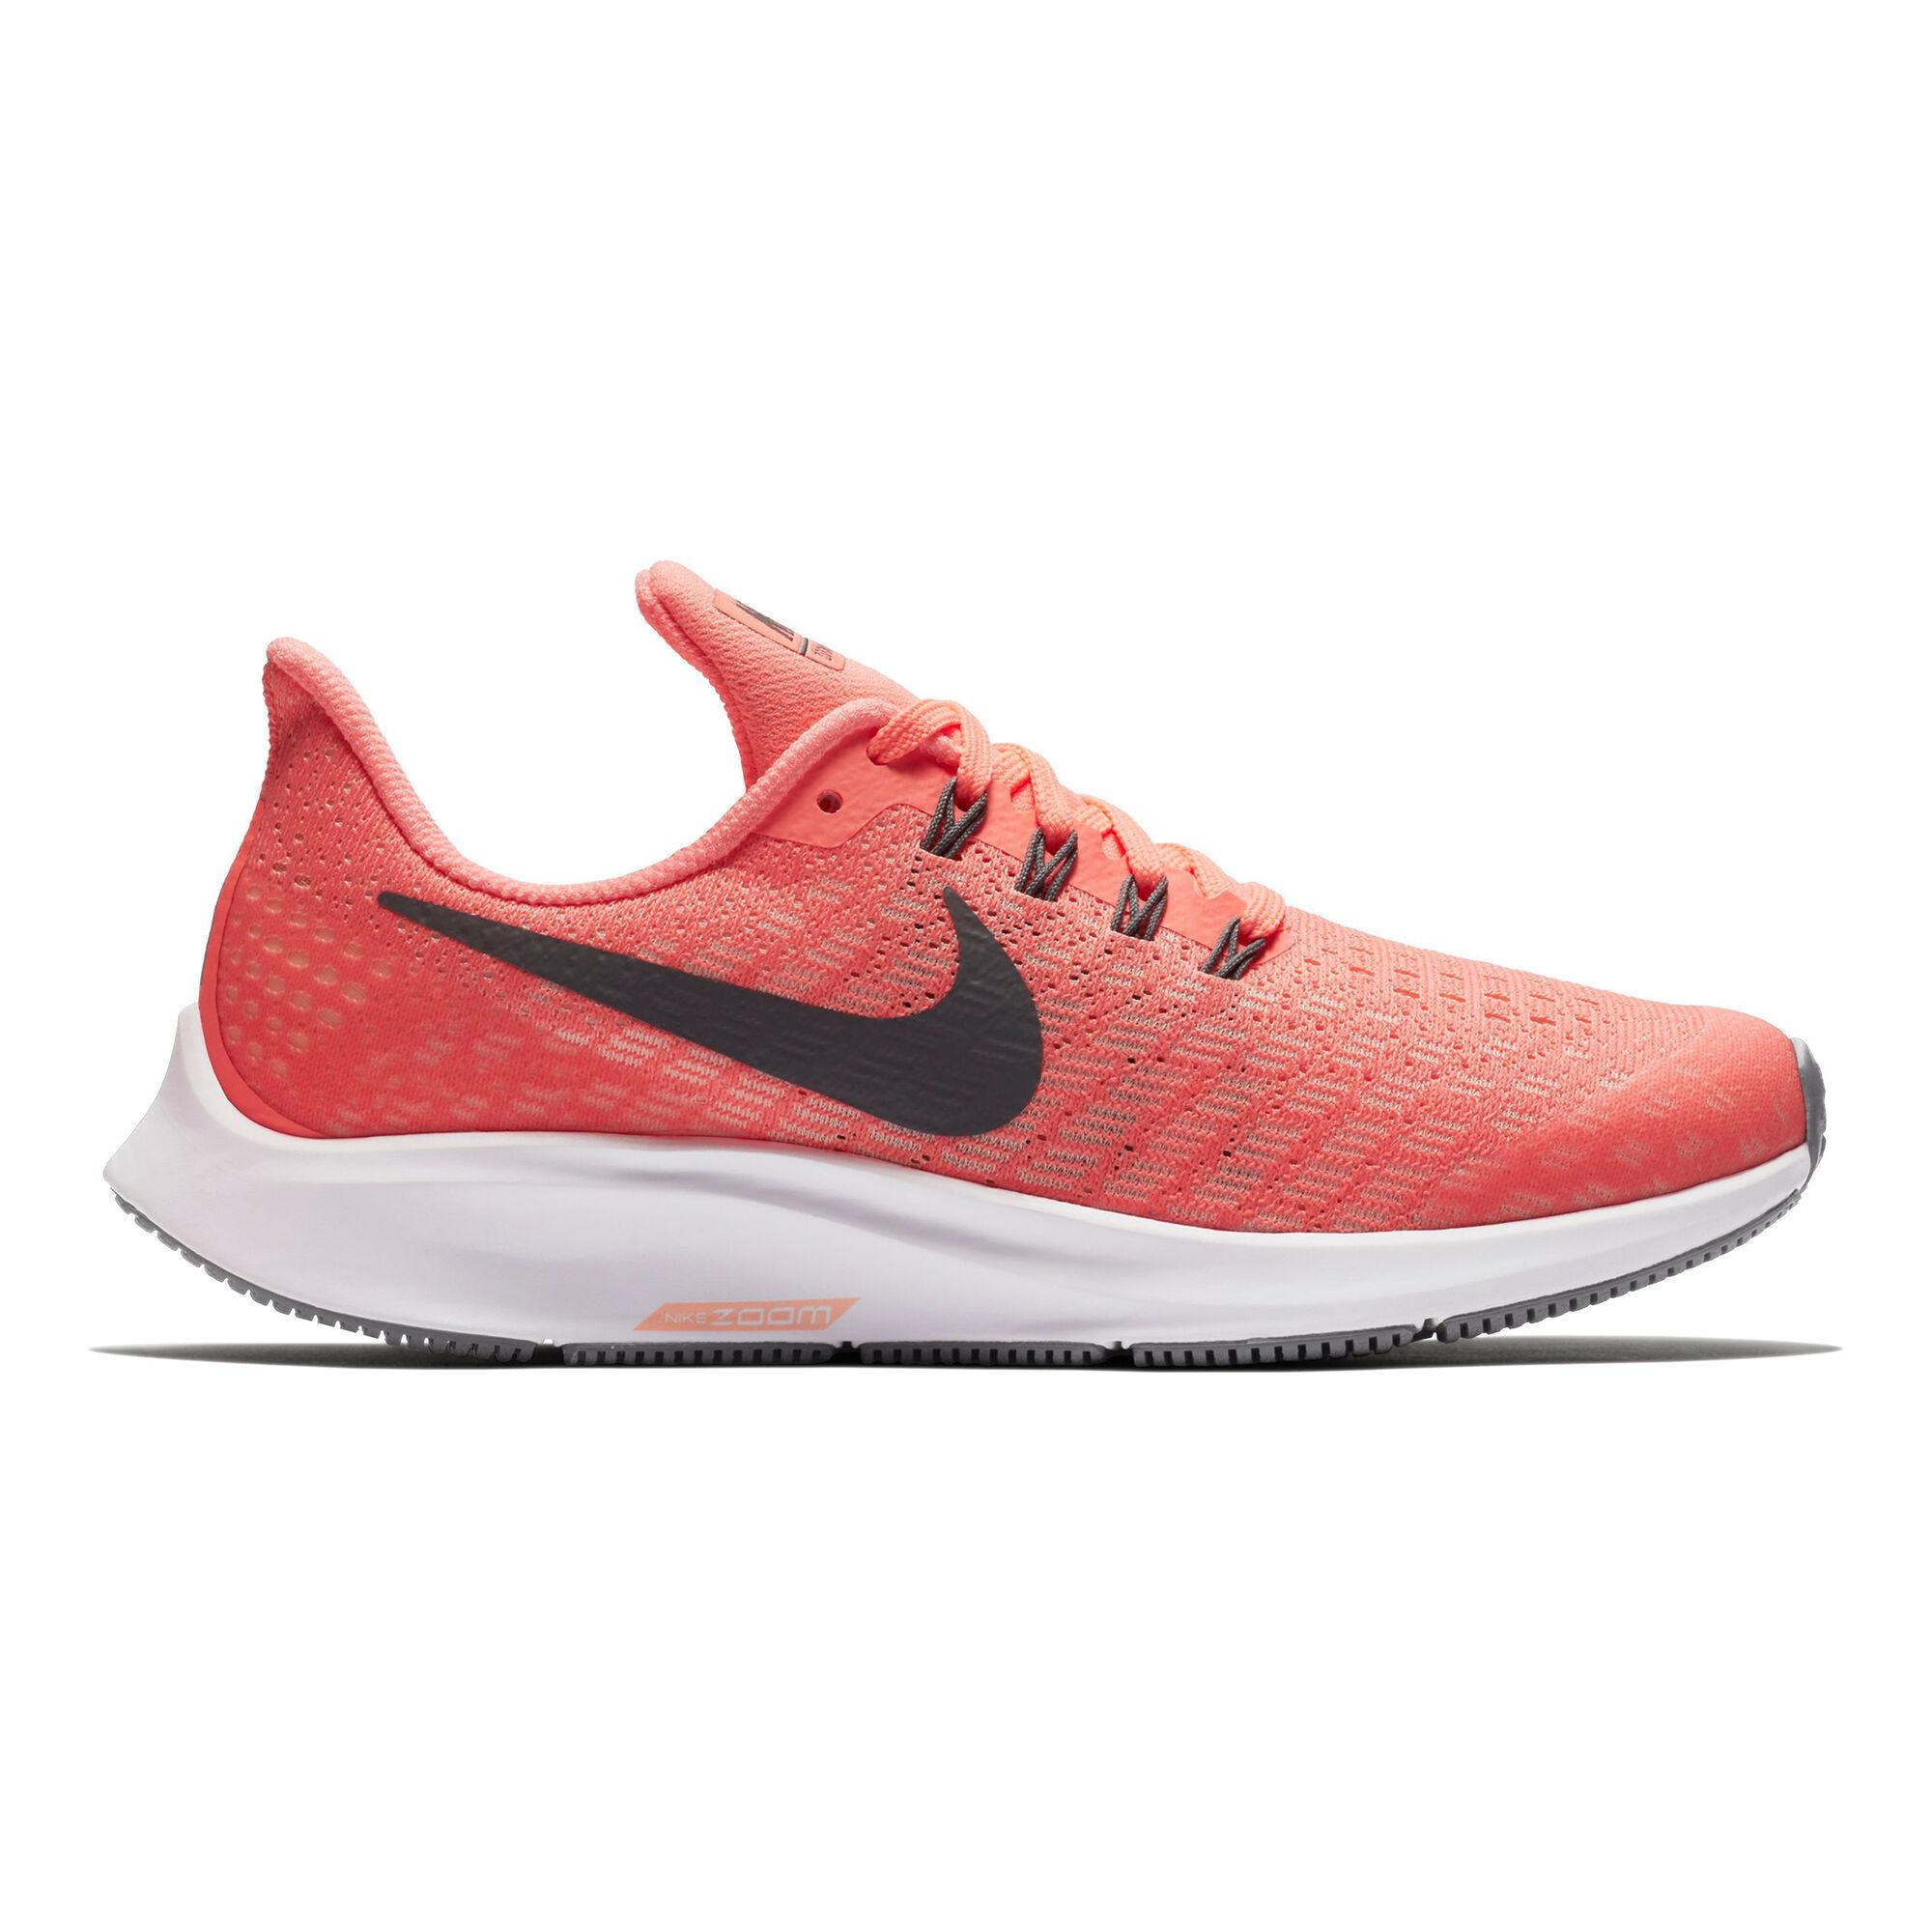 online store 36a8e 13b8c Nike · Nike · Nike · Nike · Nike · Nike · Nike · Nike · Nike · Nike. Air  Zoom Pegasus 35 GS ...